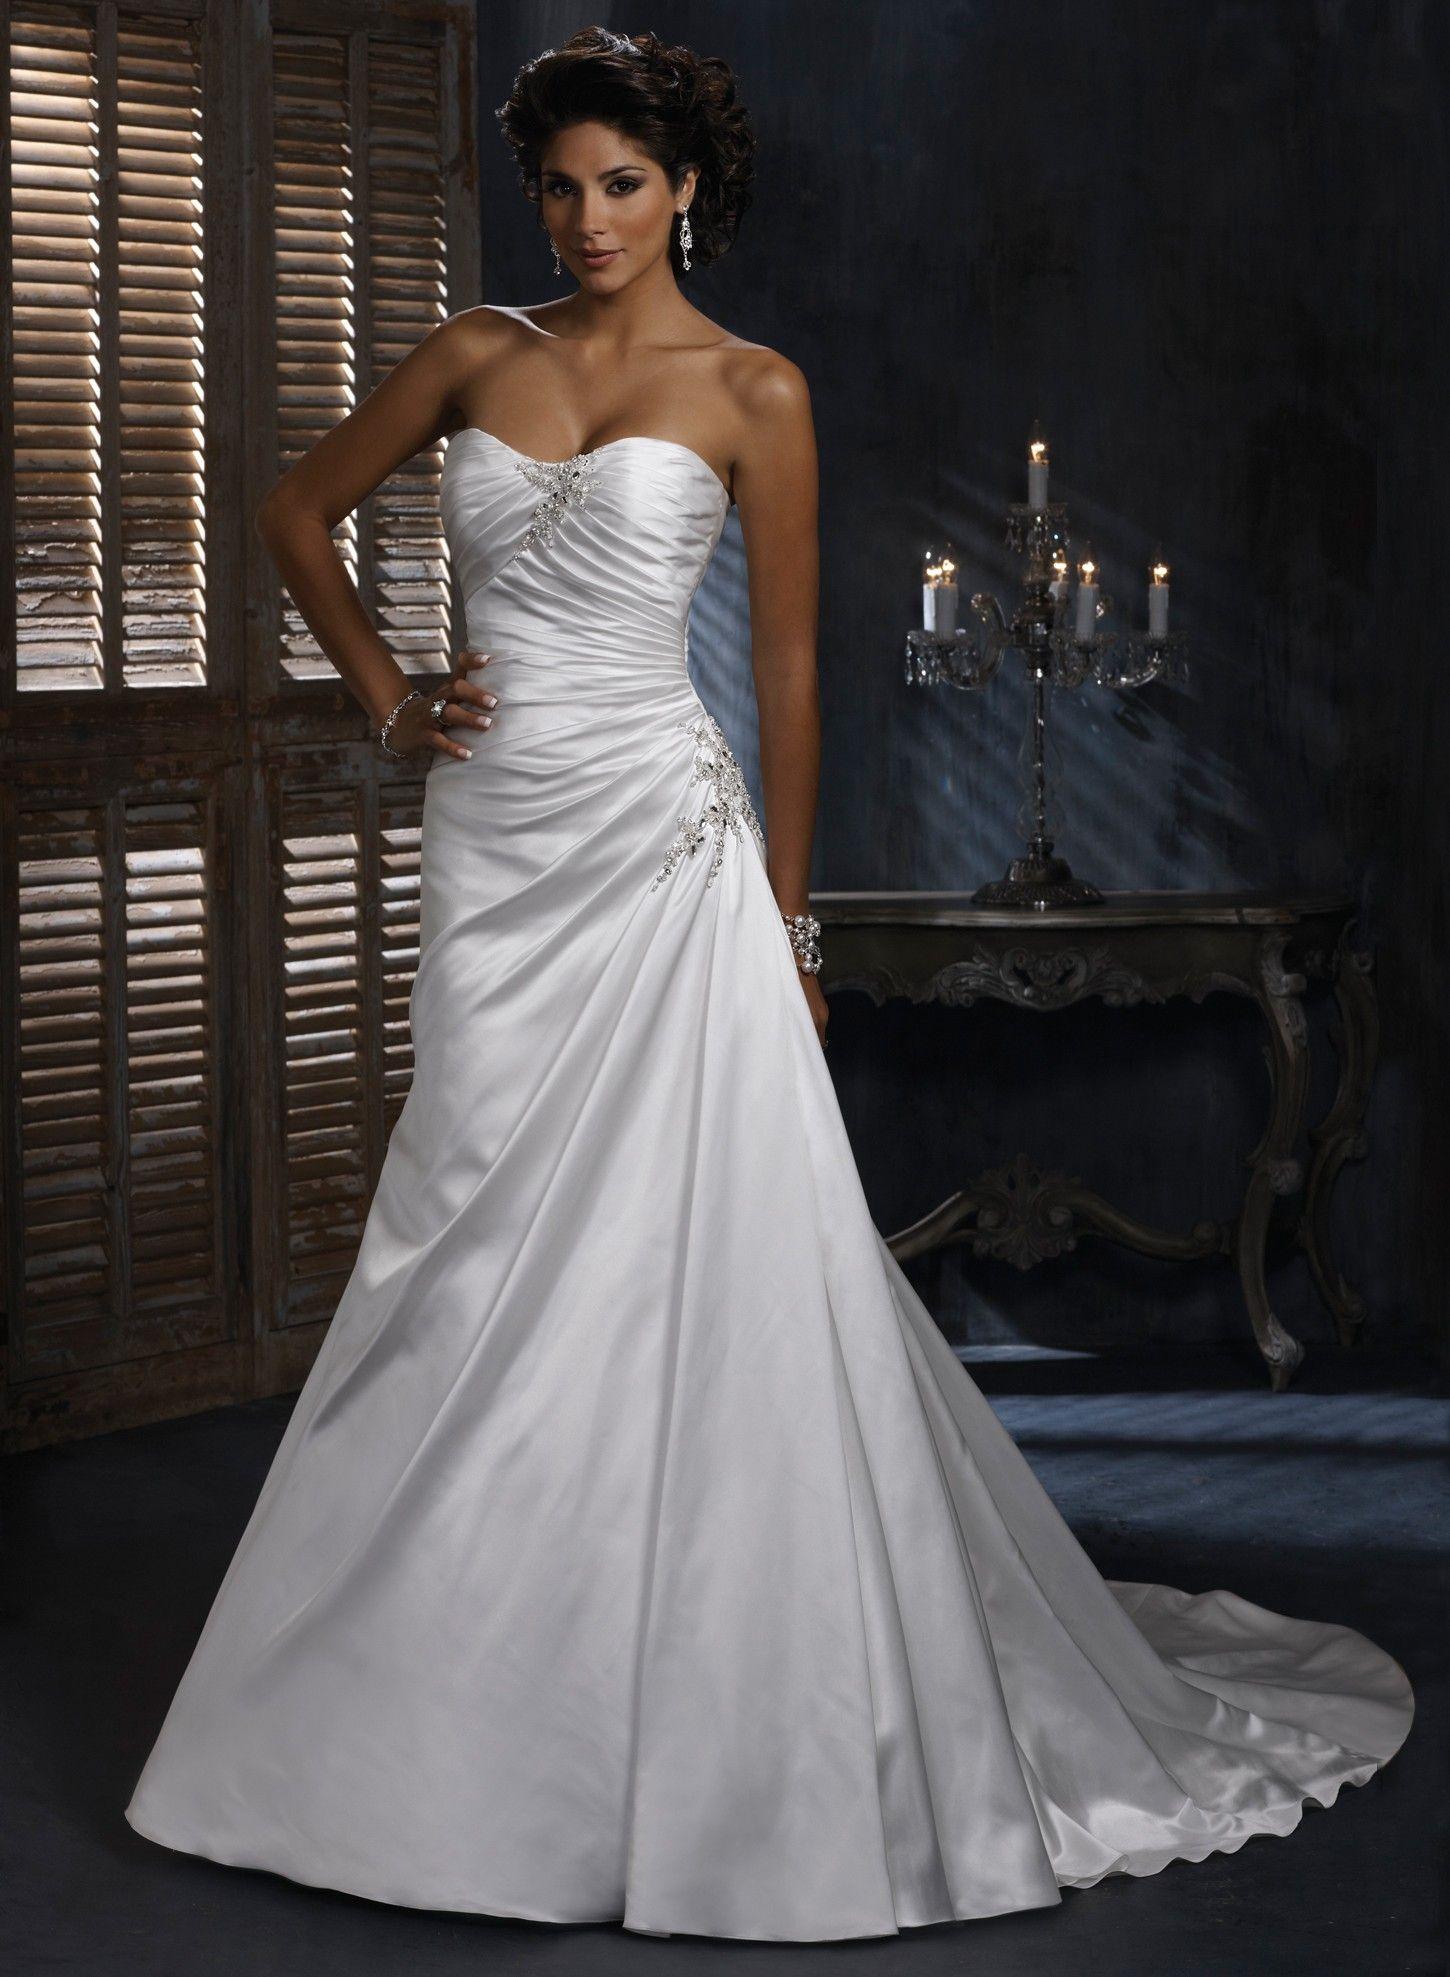 Satin A-line Dipped Strapless Neckline Wedding Dress | A-line ...